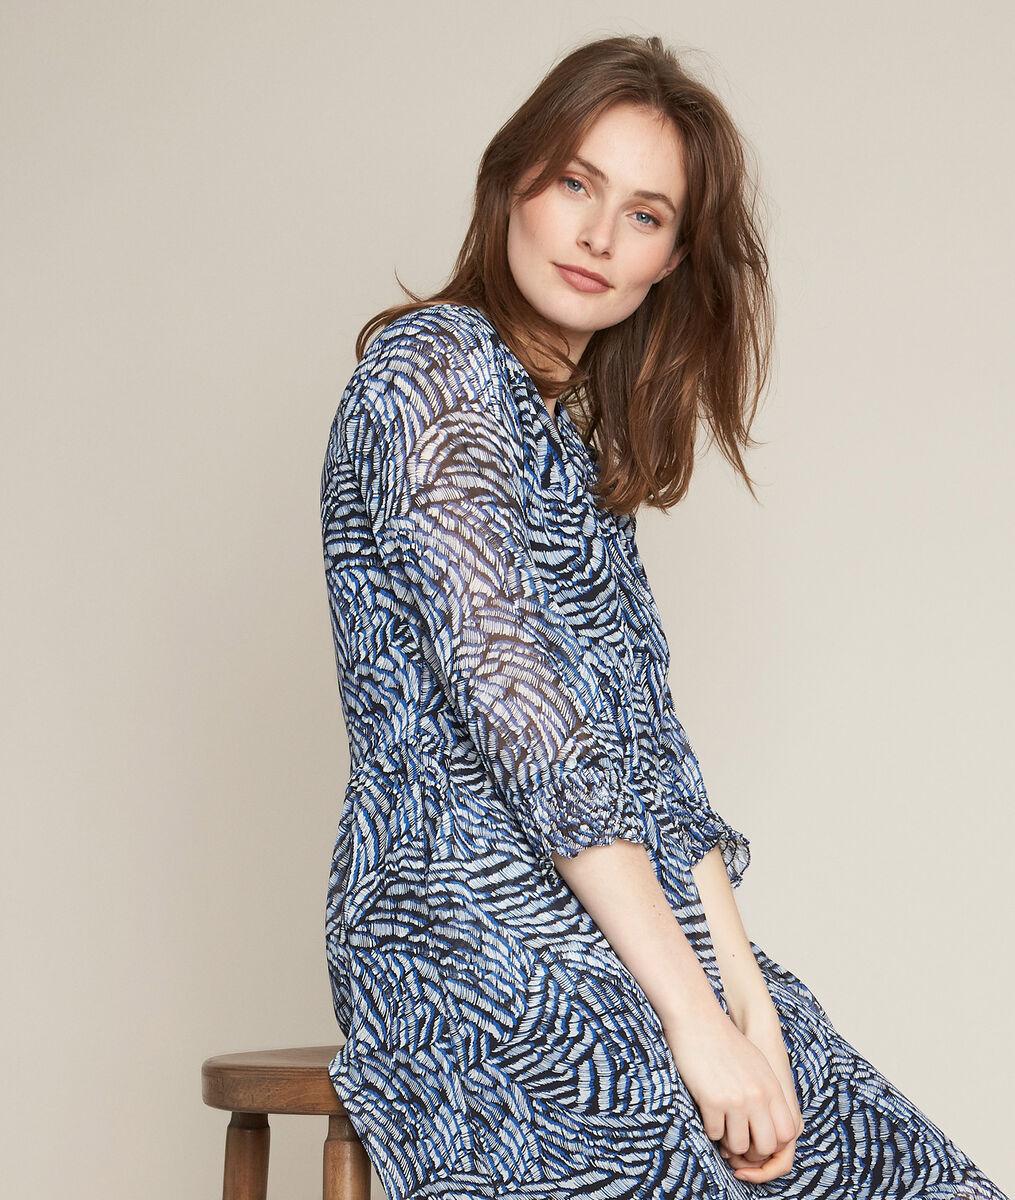 Robe Longue Imprimee Libra Femme Maison 123